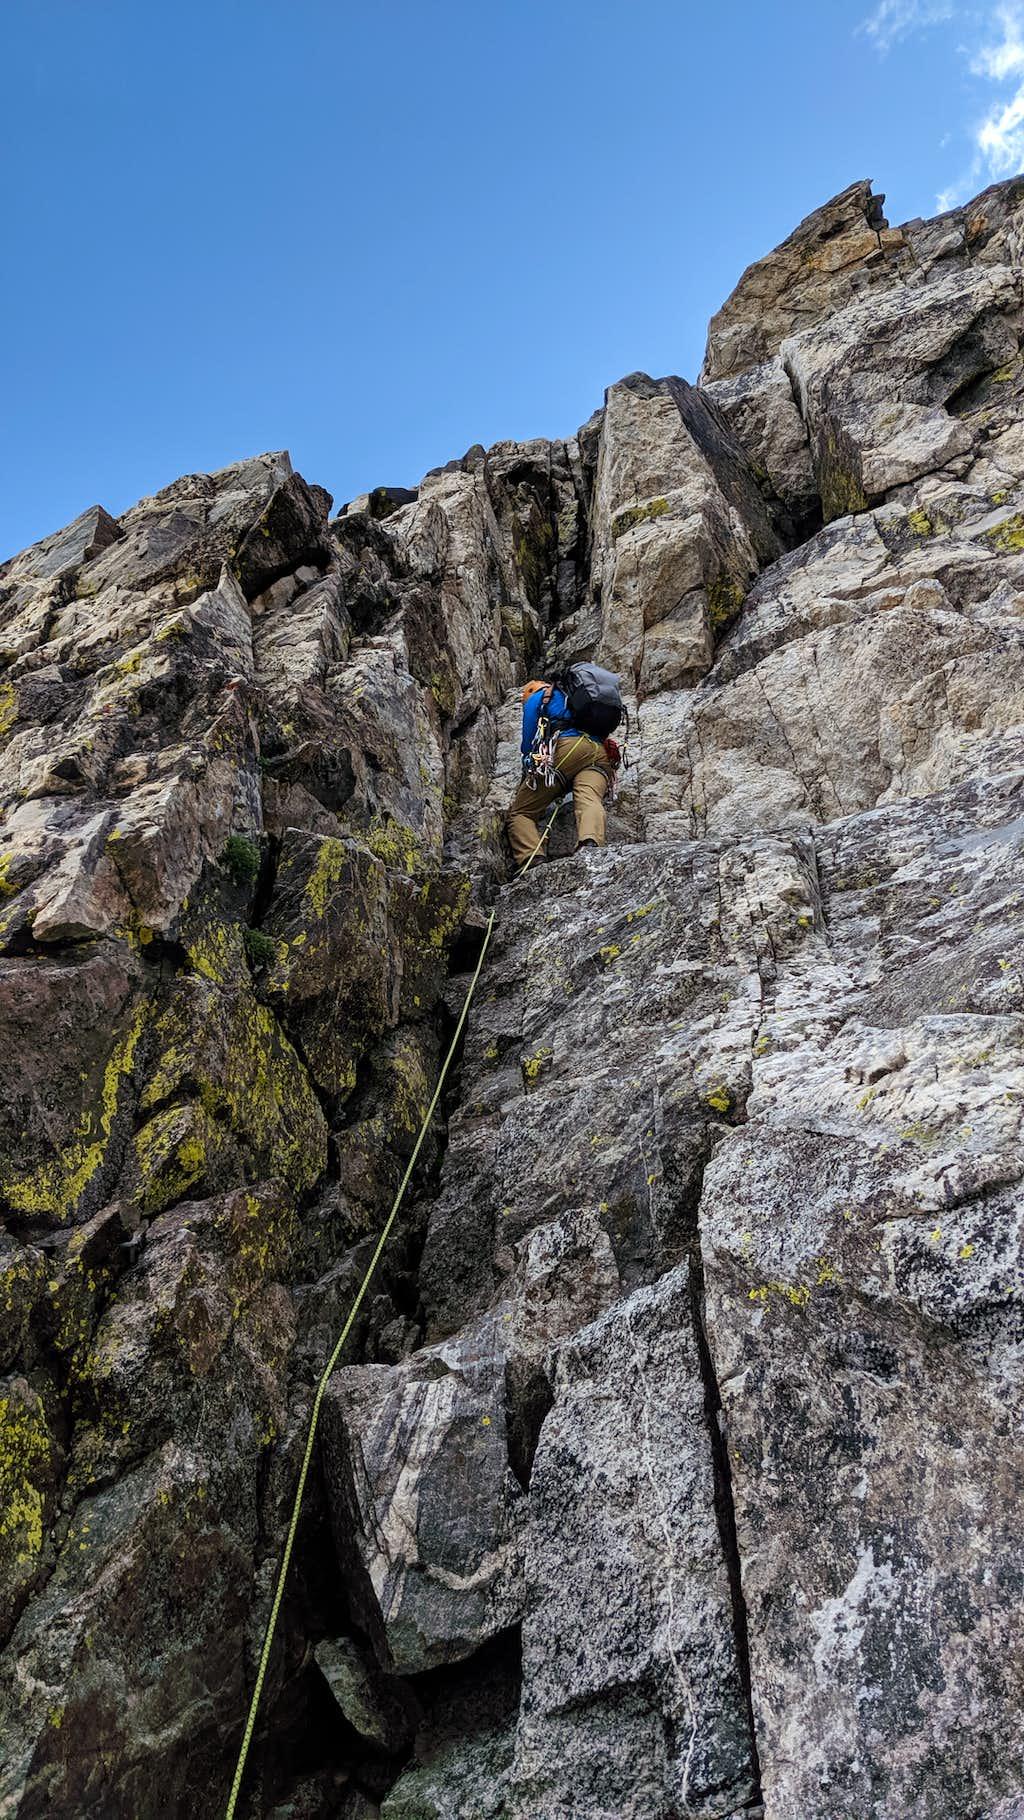 Climbing the 5.6 chimney up Ice Cream Cone